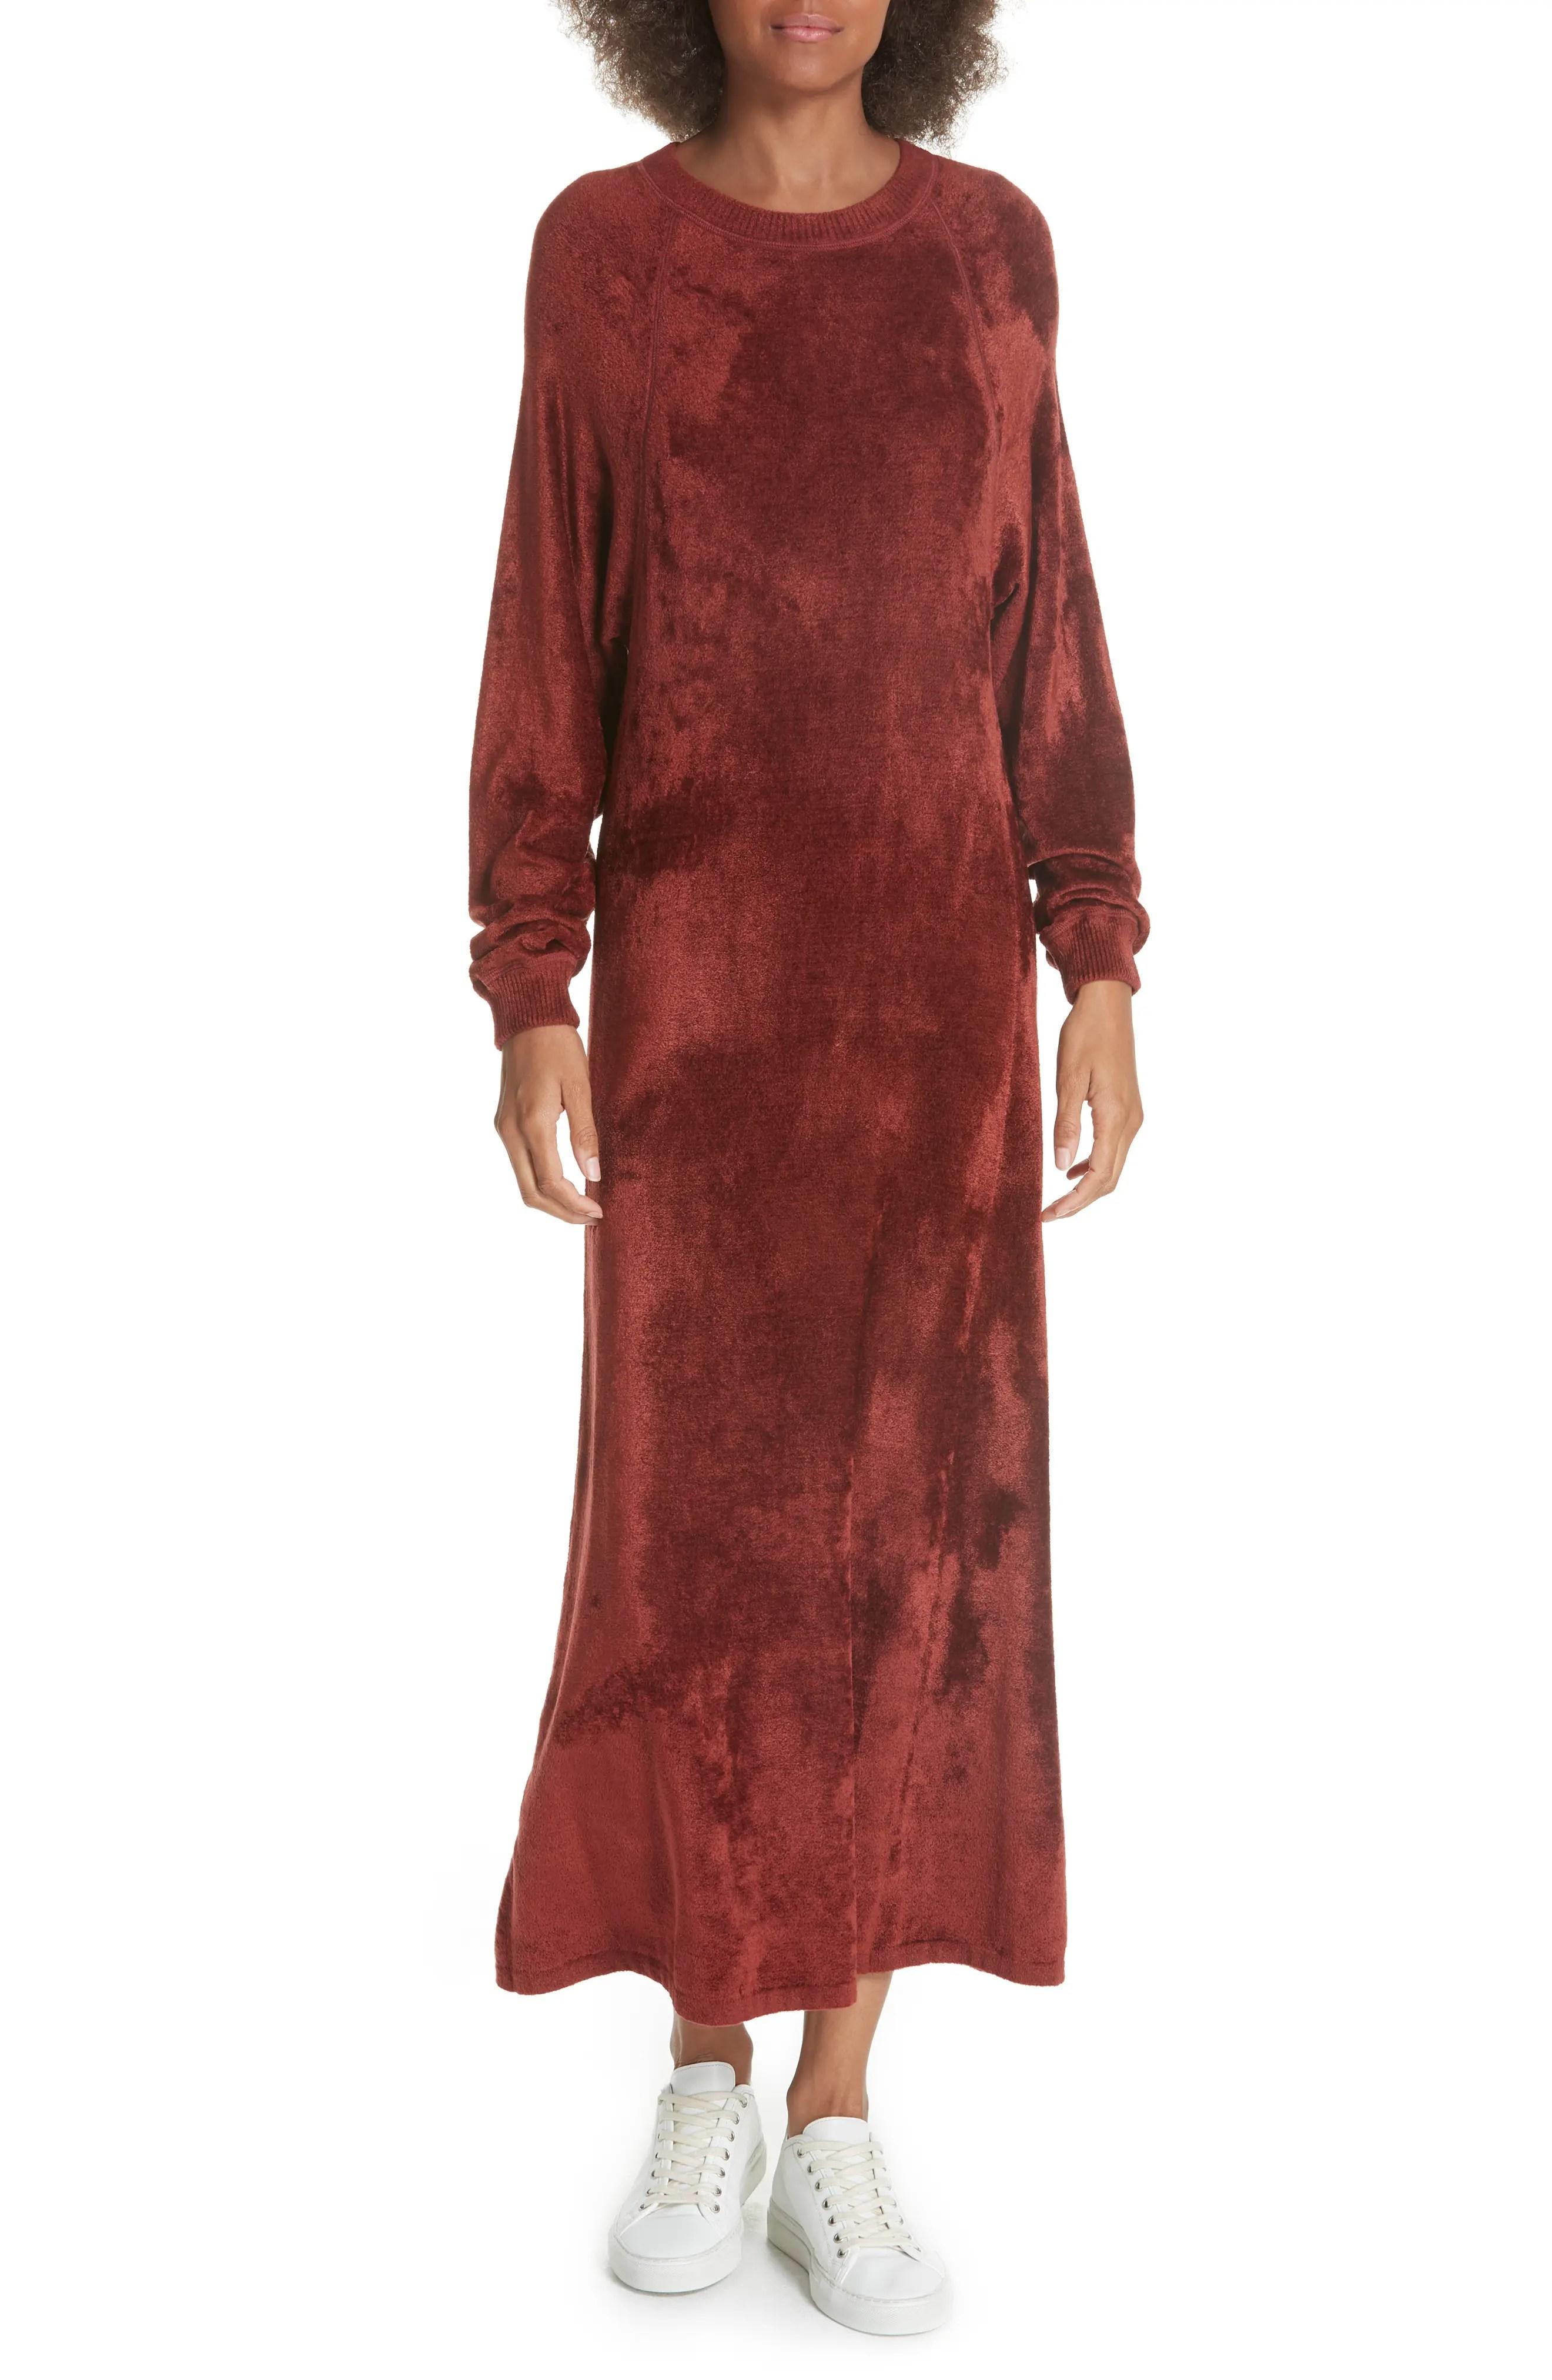 Elizabeth and james lafayette velvet sweatshirt dress also clothing nordstrom rh shoprdstrom